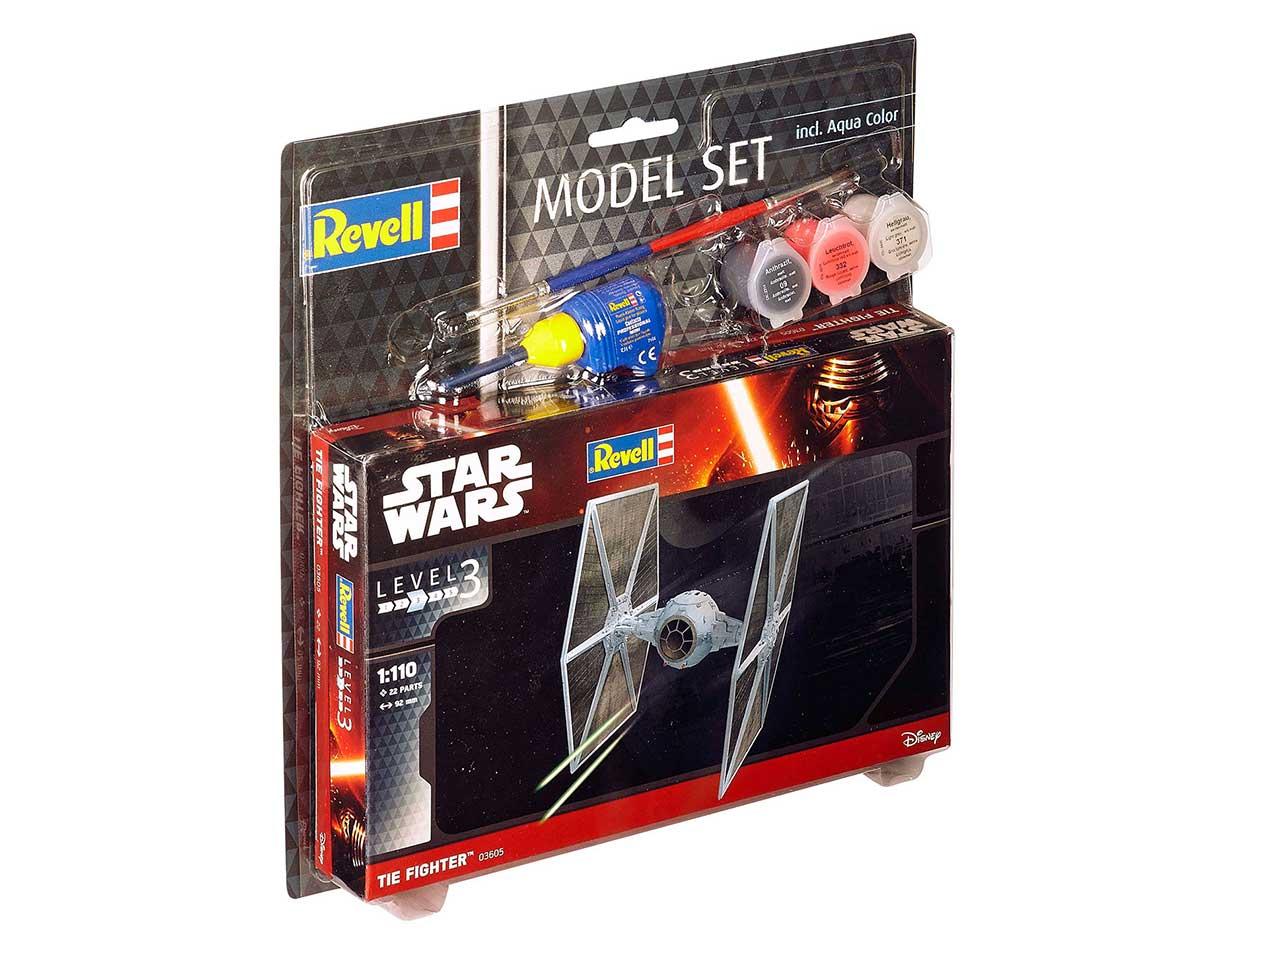 1:110 TIE Fighter, Star Wars (Model Set)